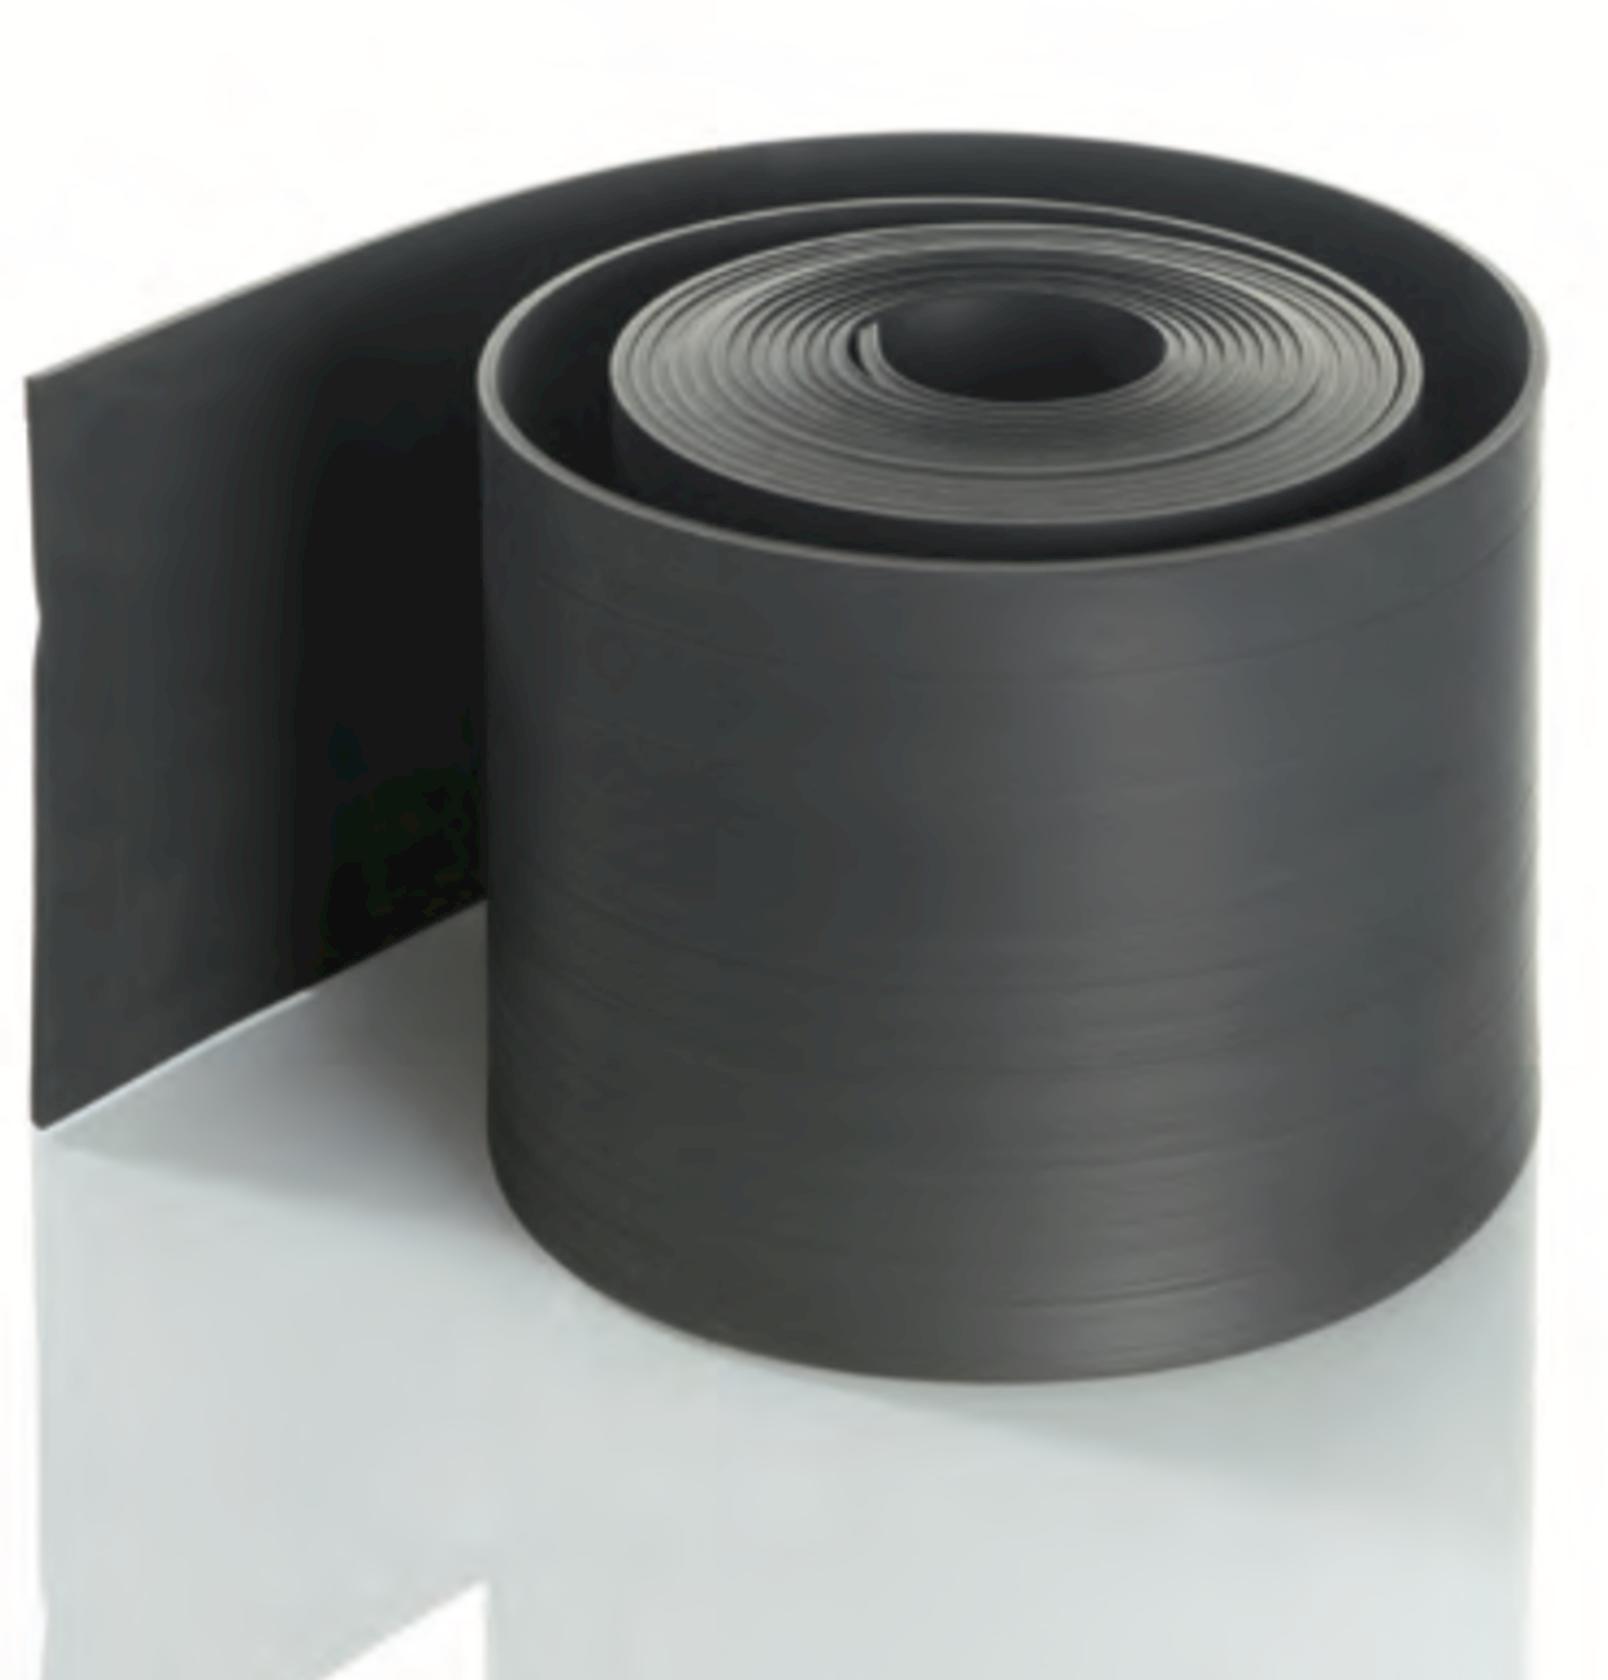 Ecorub afboording H10cm - L5m